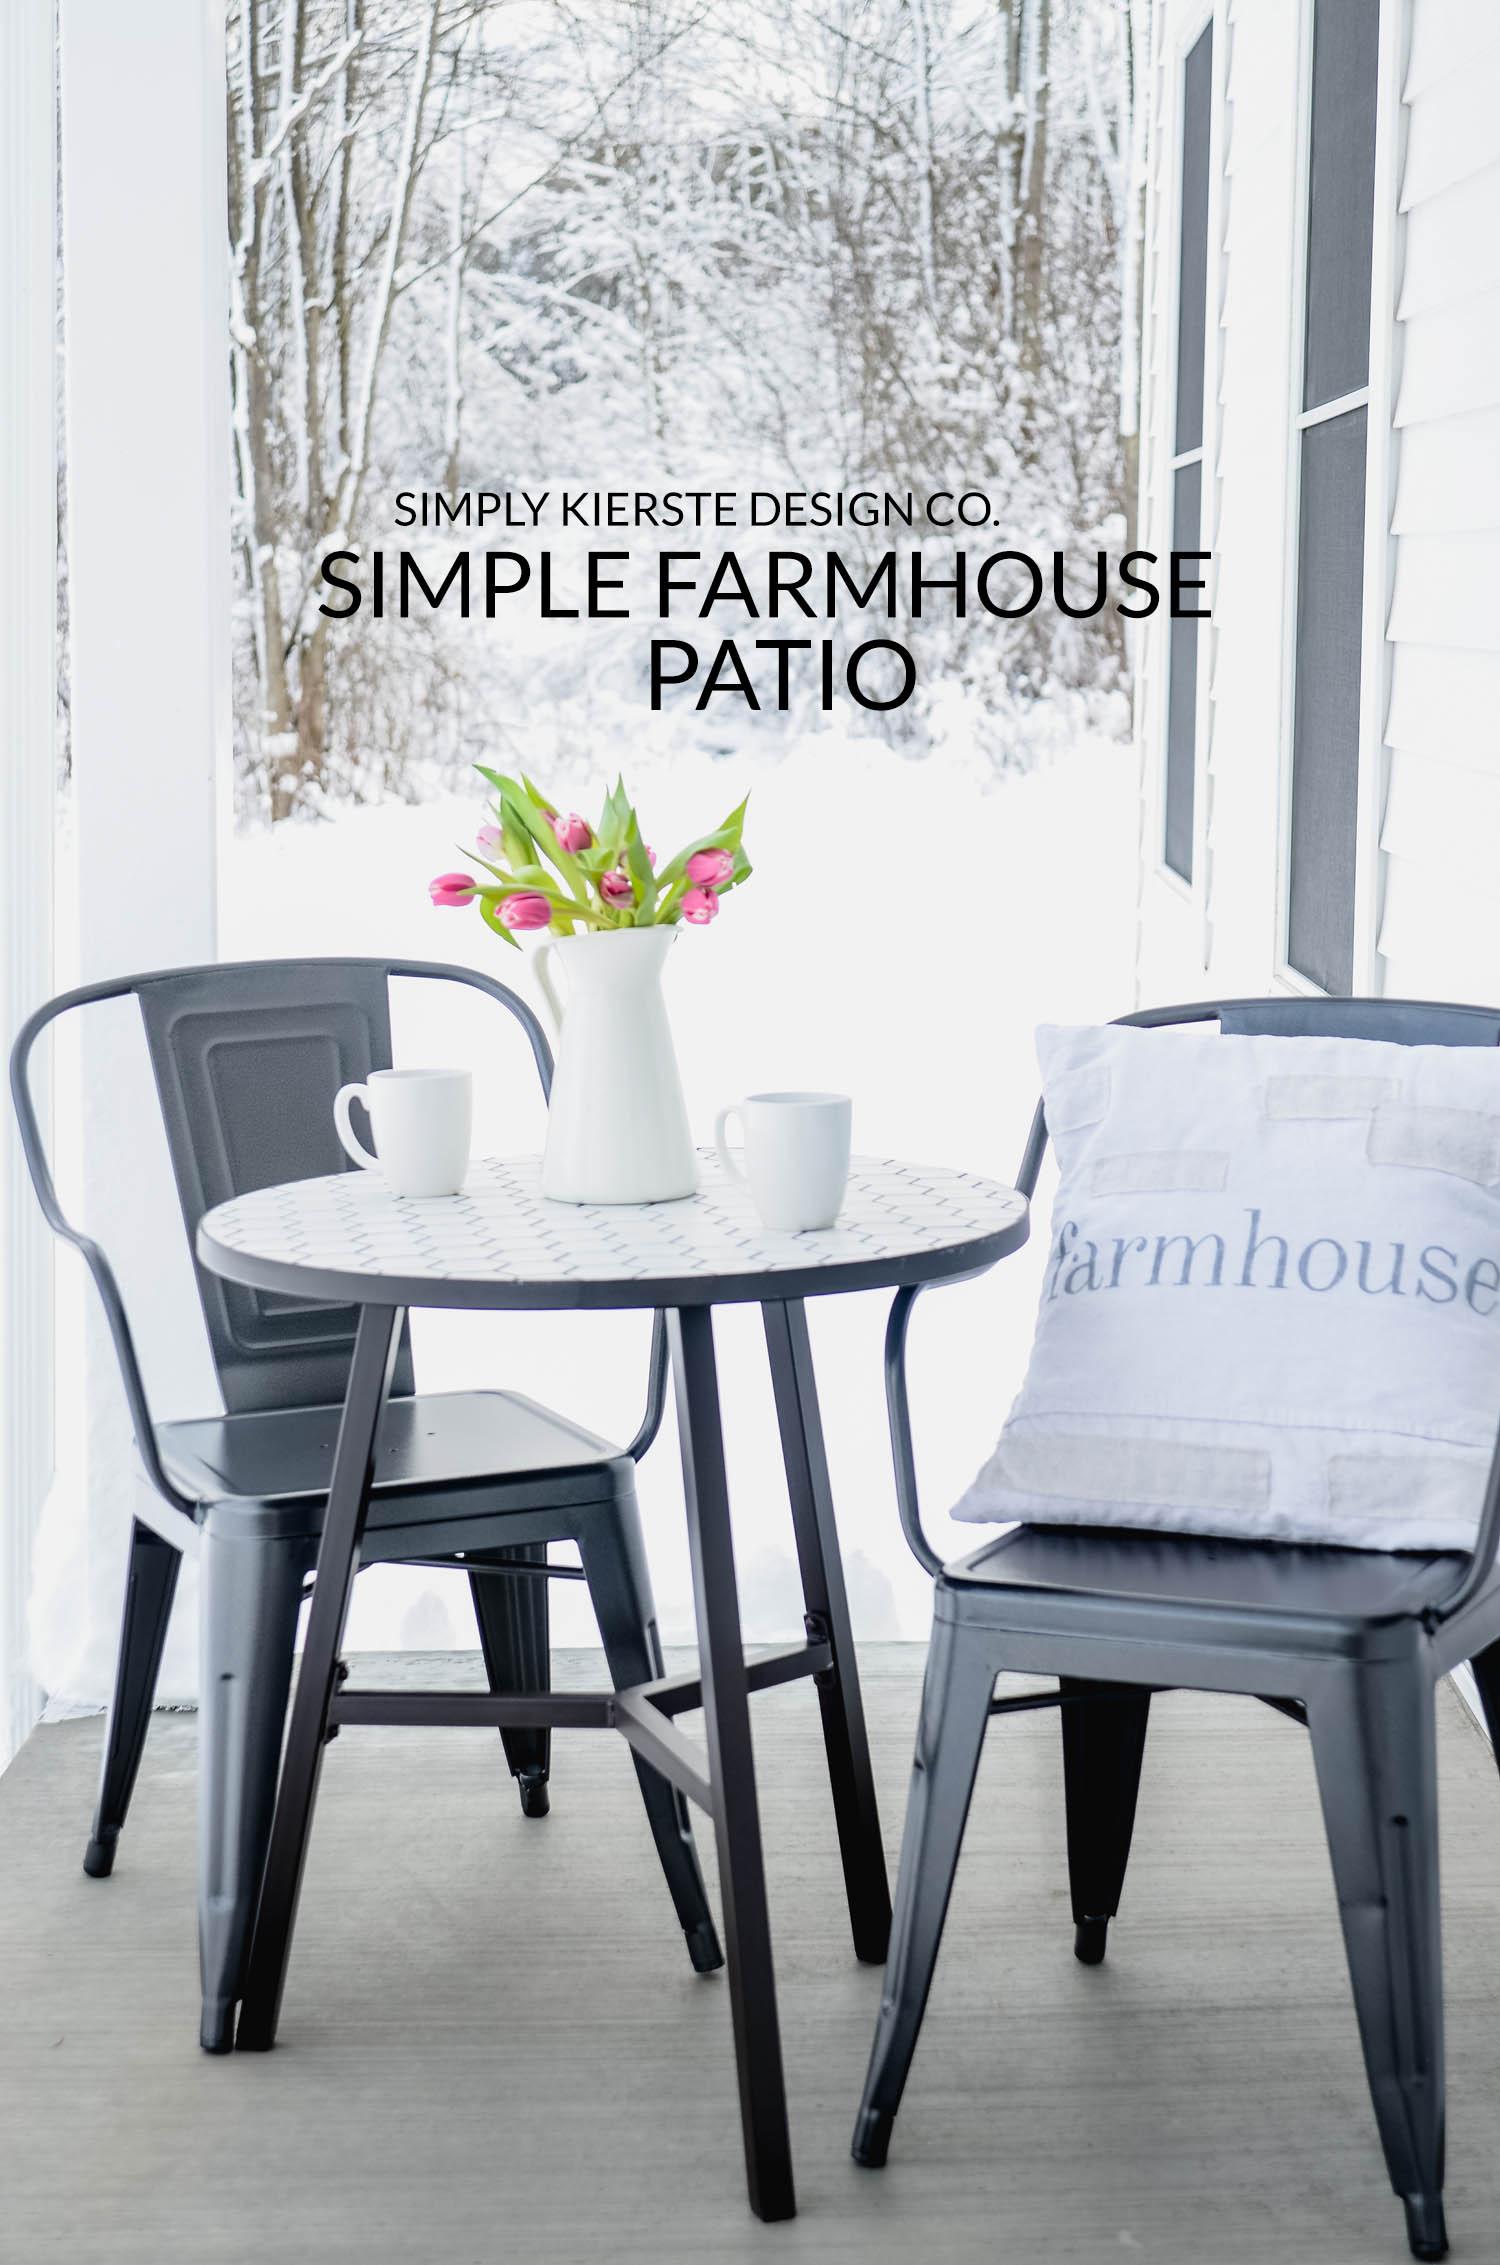 Simple Farmhouse Patio | Cozy Front Porch | simplykierste.com #farmhouse #farmhousestyle #outdoorentertaining #patiofurniture